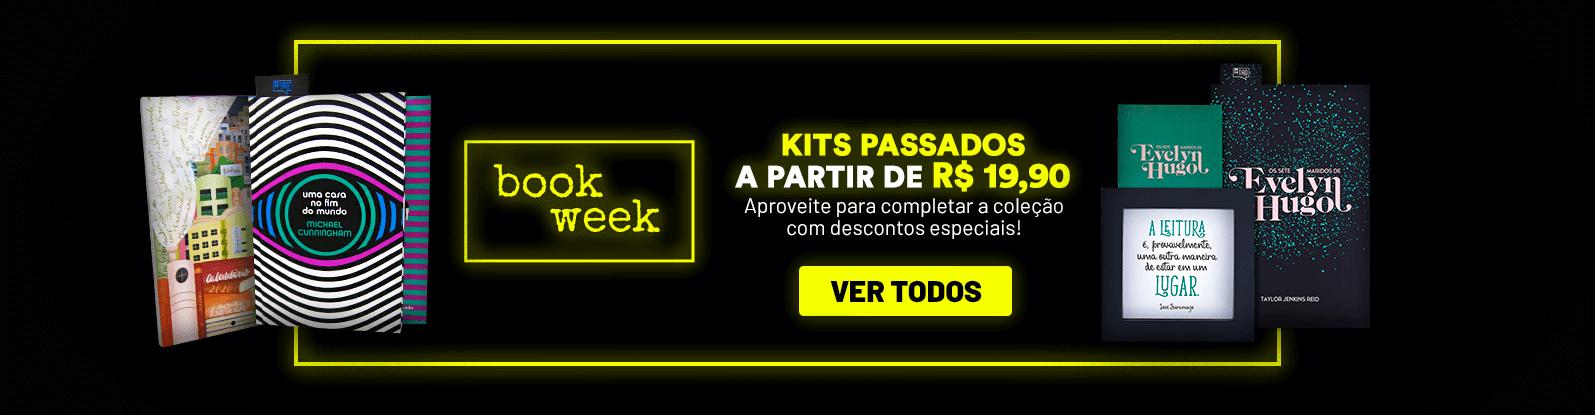 Book Week Kits